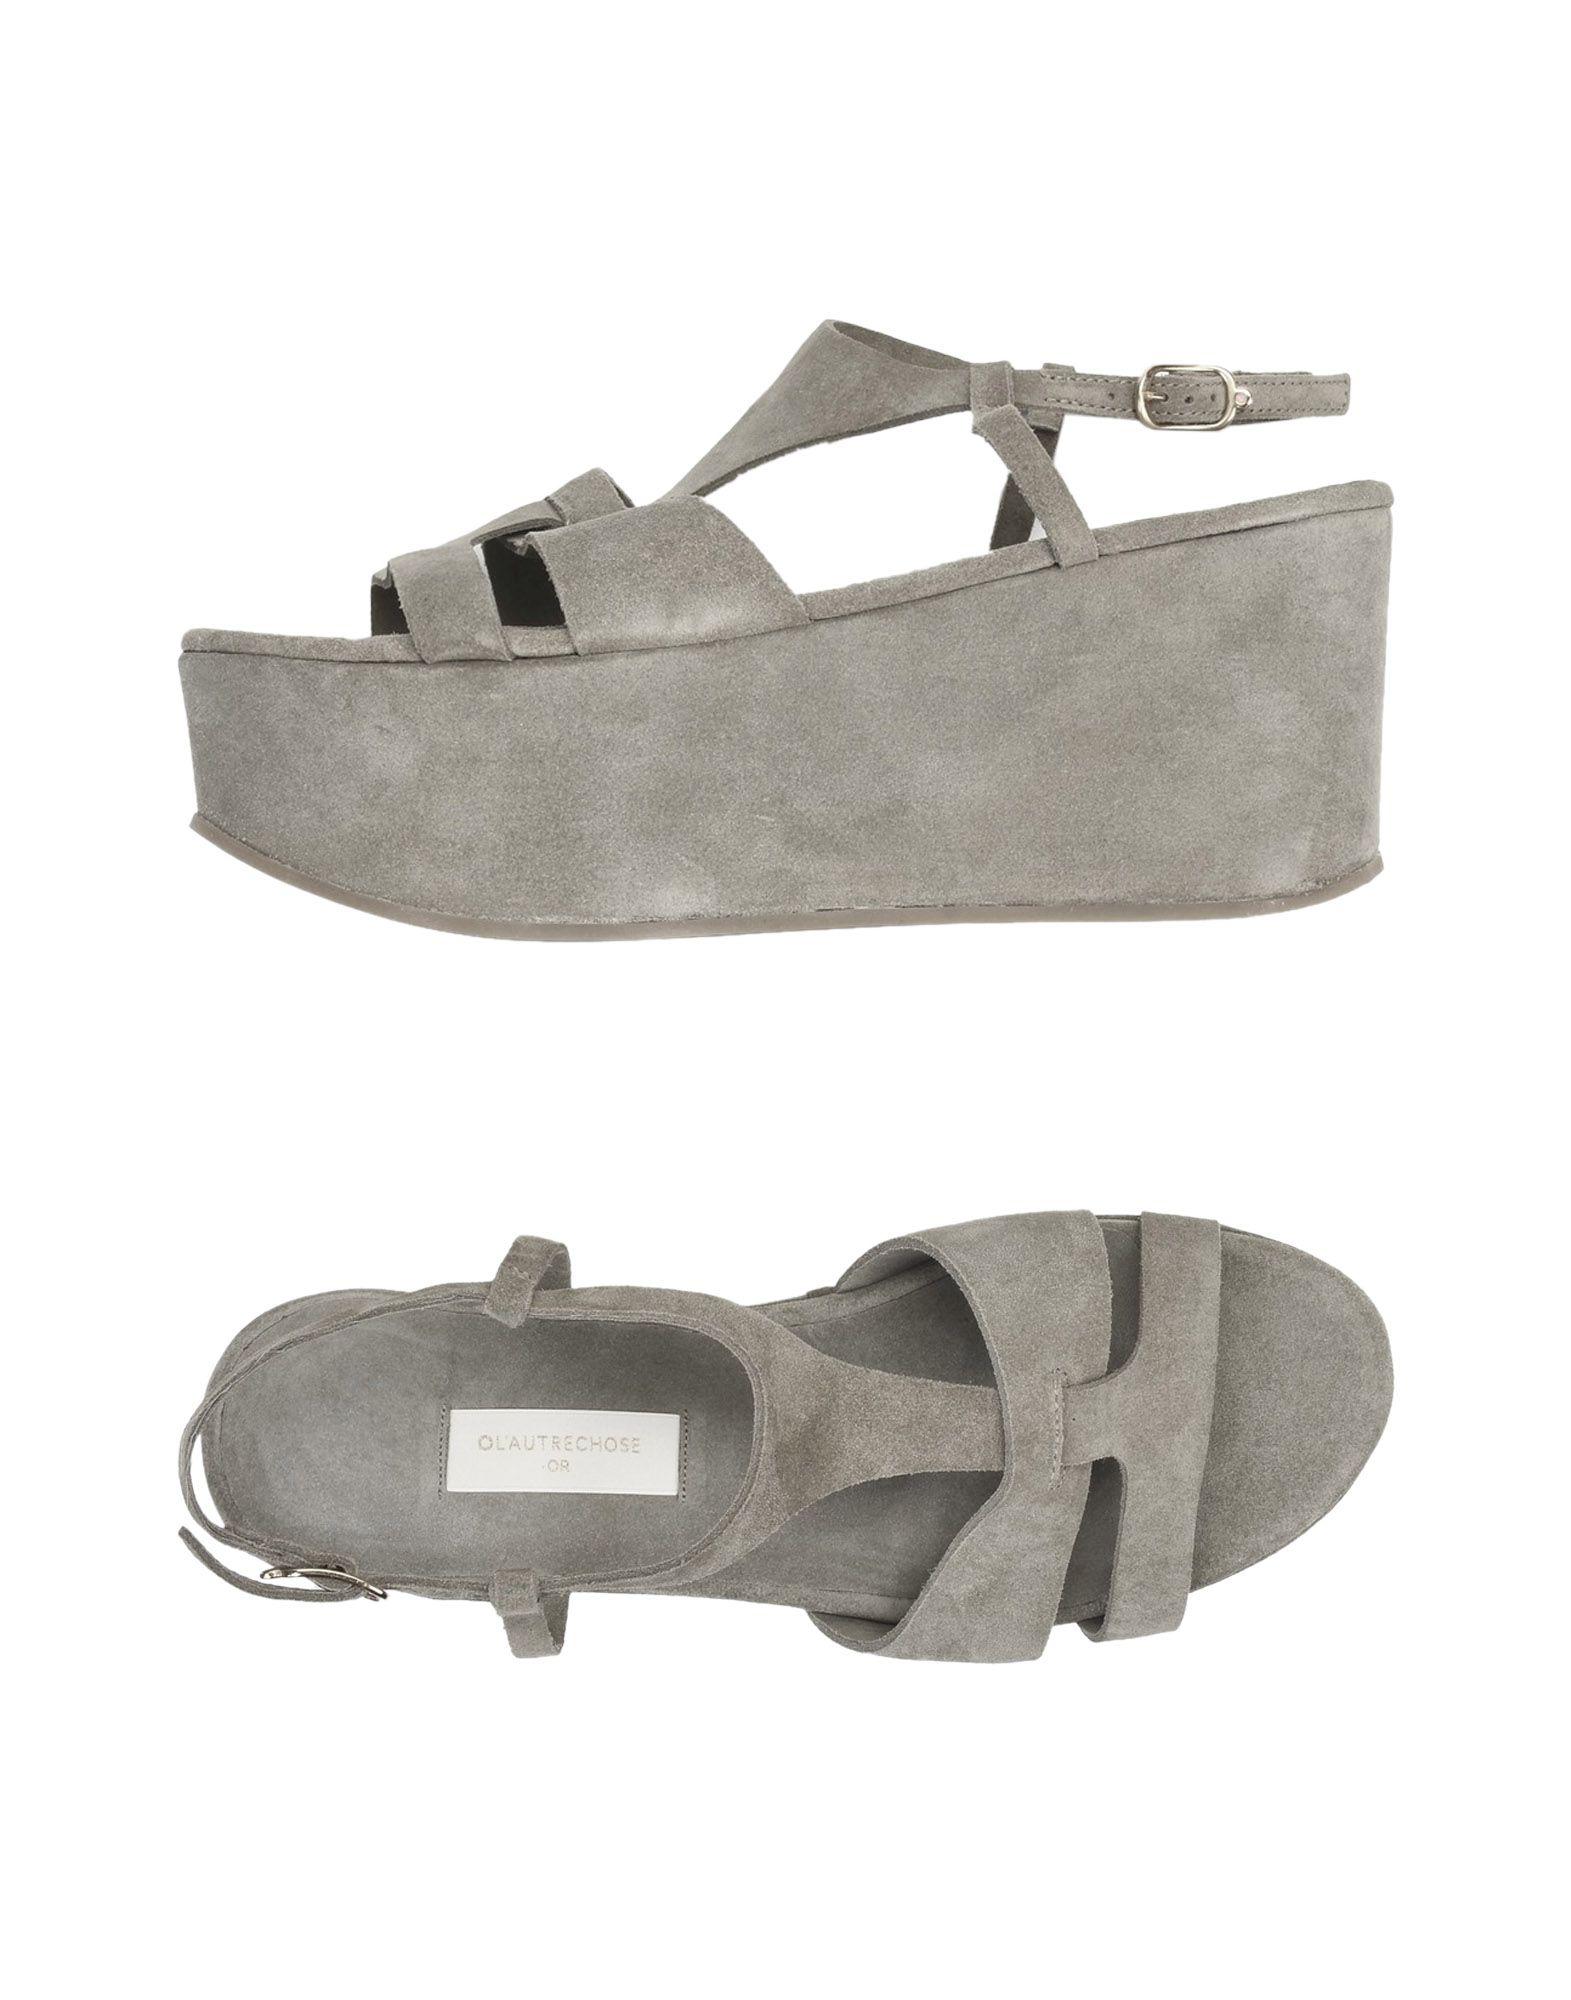 Stilvolle billige Sandalen Schuhe L' Autre Chose Sandalen billige Damen  11508212FQ d7f987